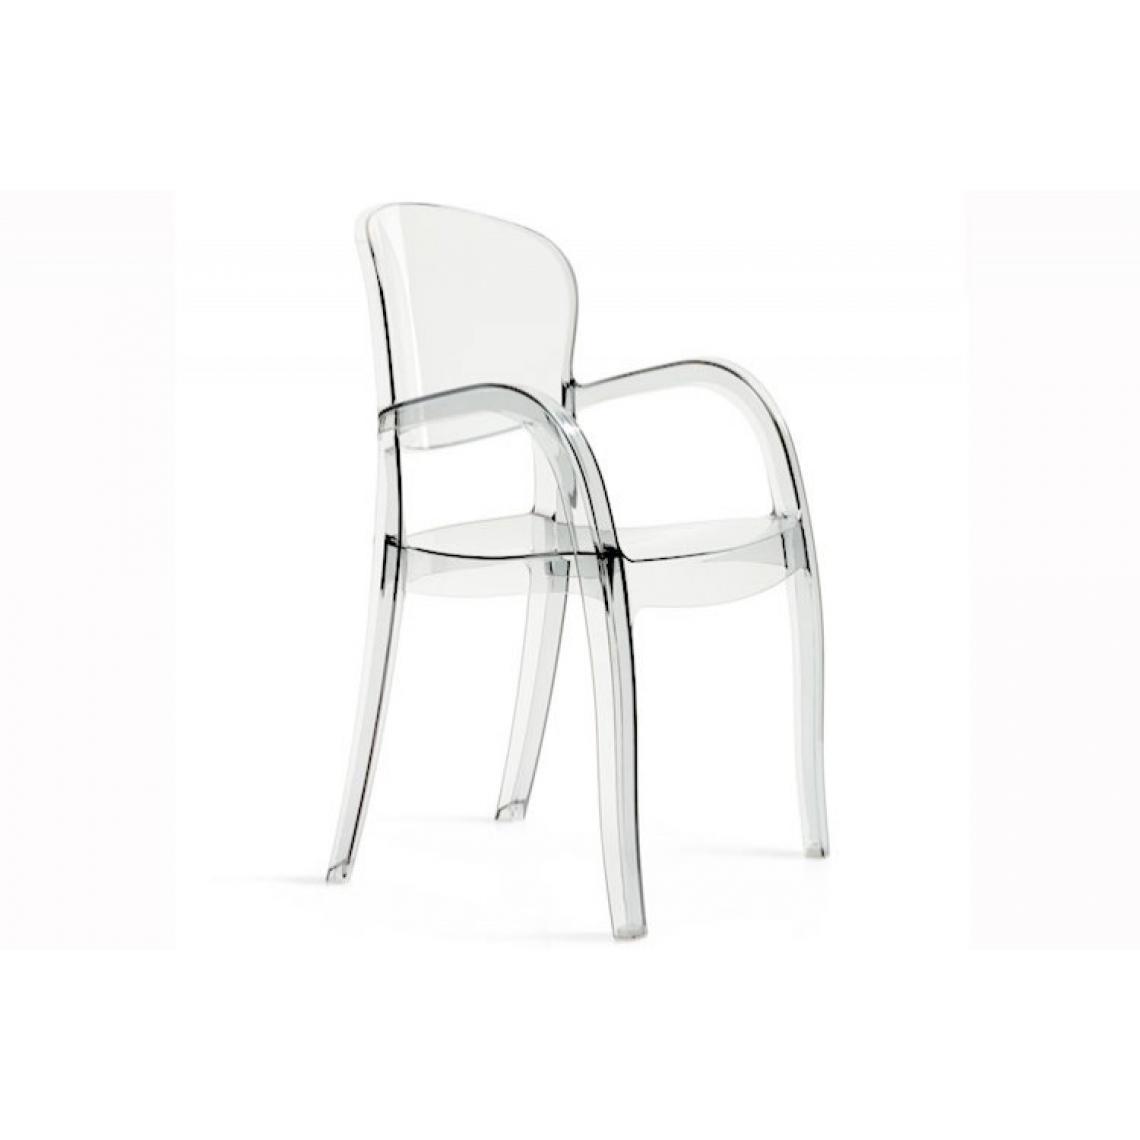 Transparente Chaise Transparente Chaise Victor3 Design Design Victor3 Suisses CxeBod